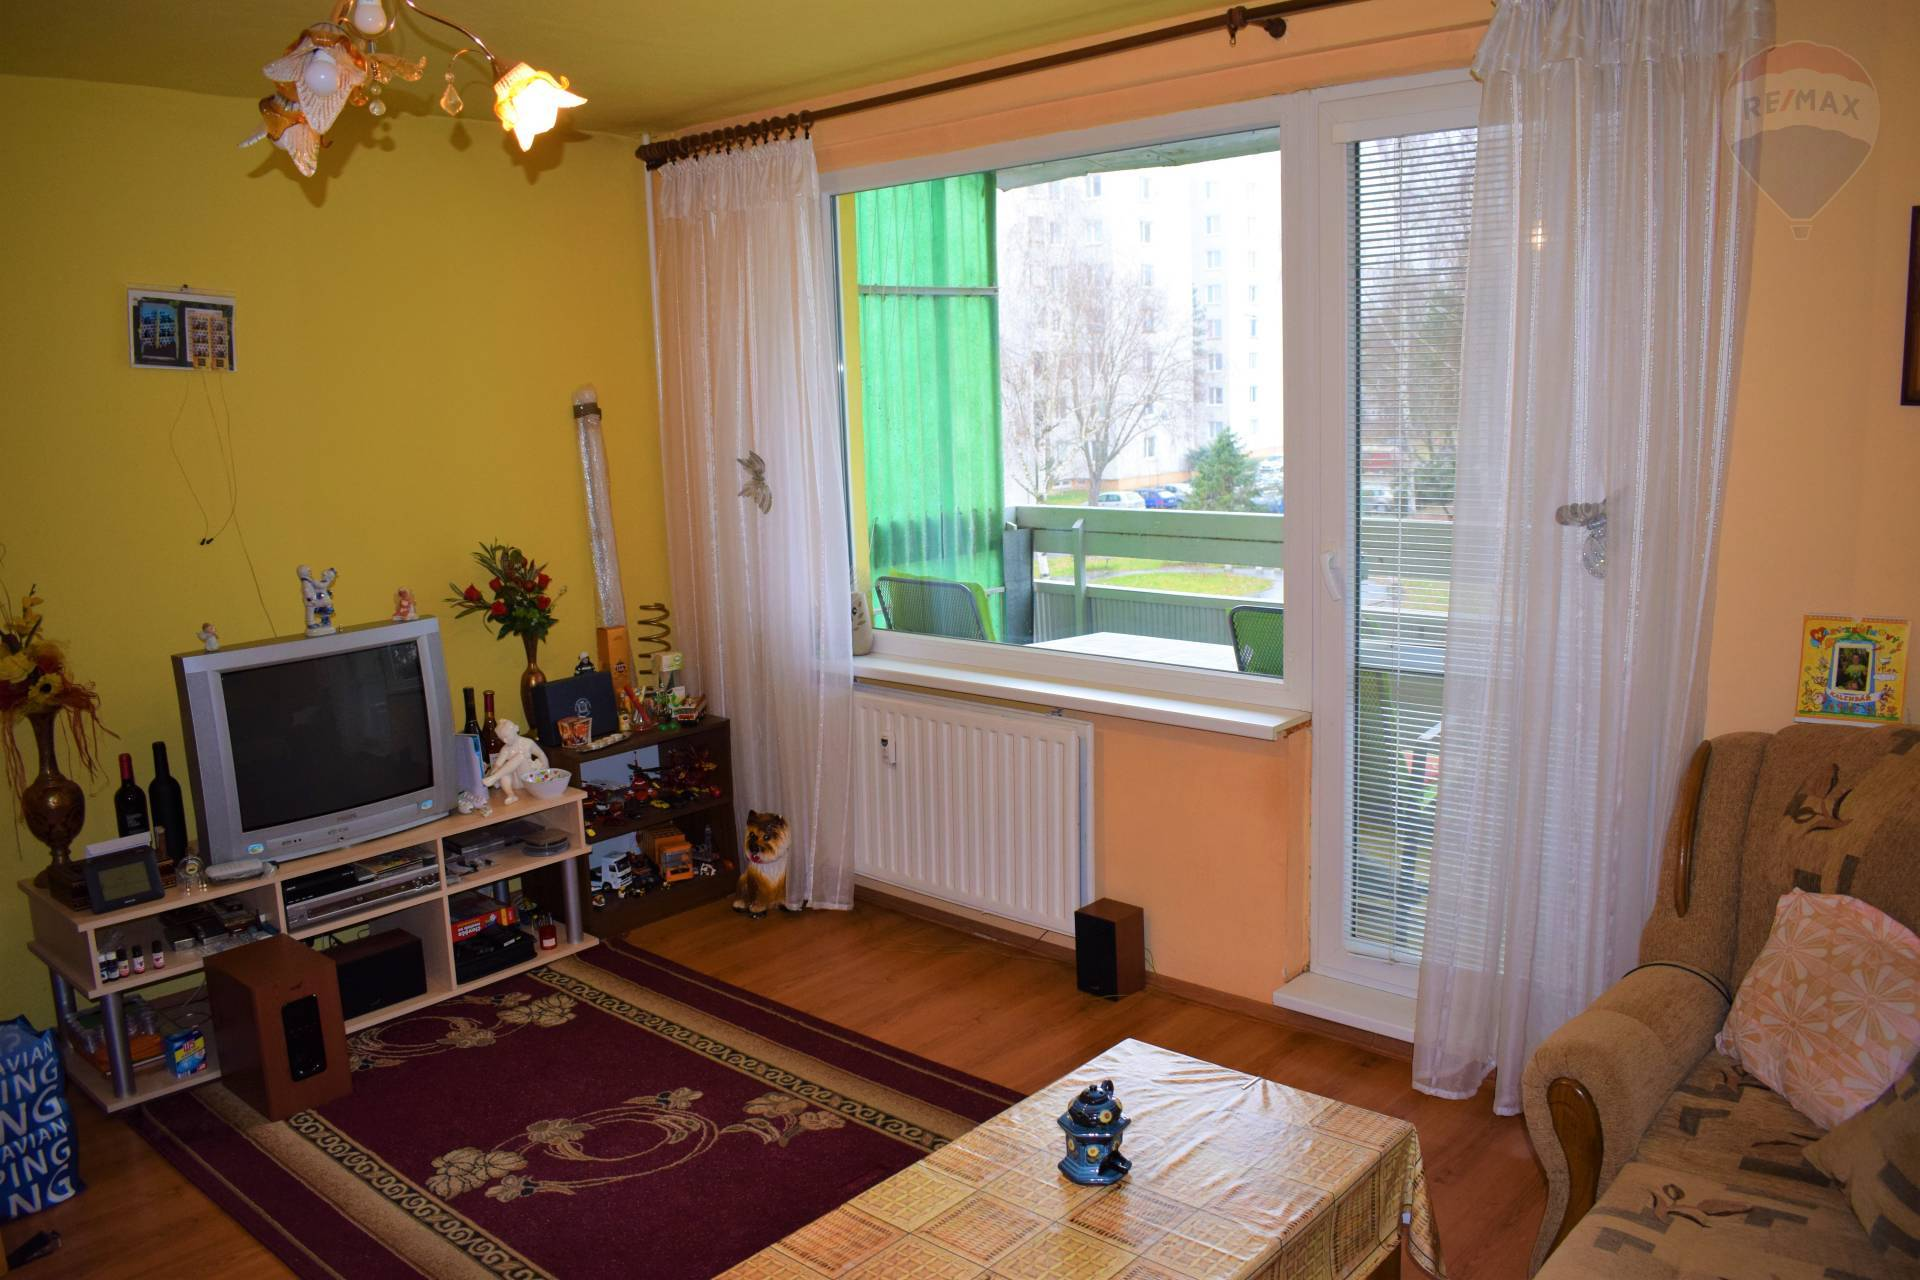 3 izbový byt na Laboreckej ulici v Humennom, na predaj.